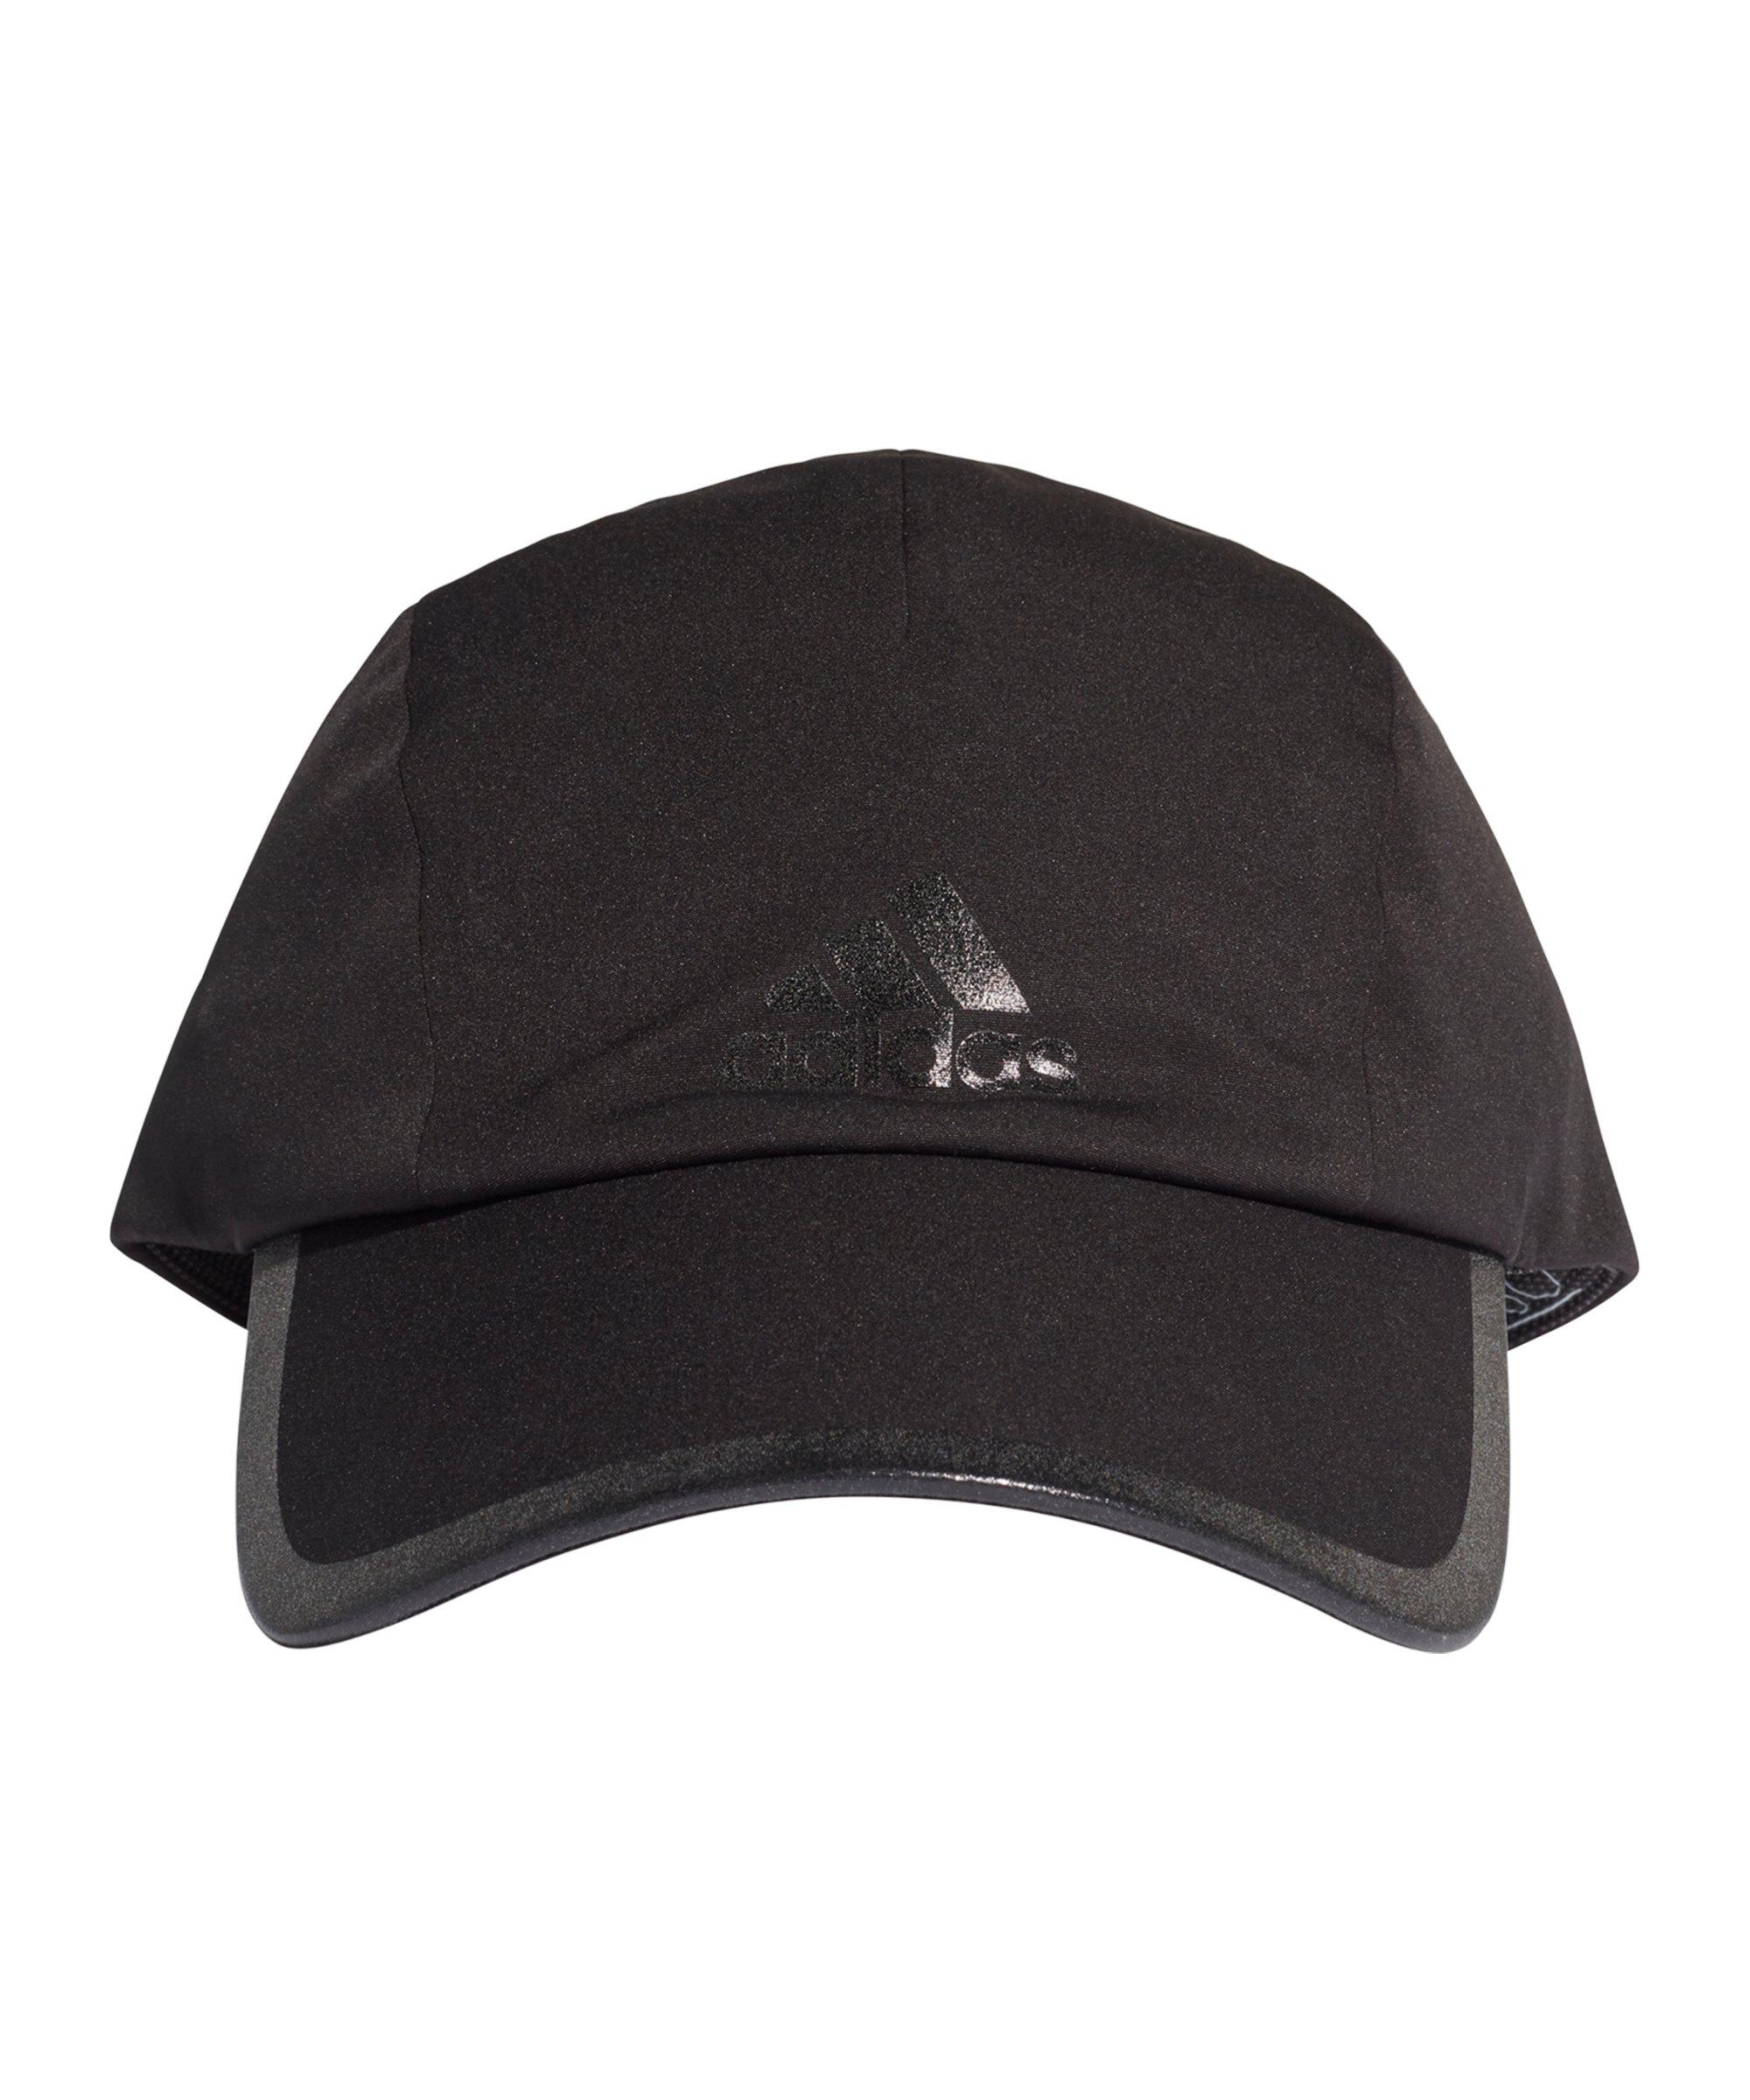 adidas Run Bonded Cap Schwarz Grau - schwarz